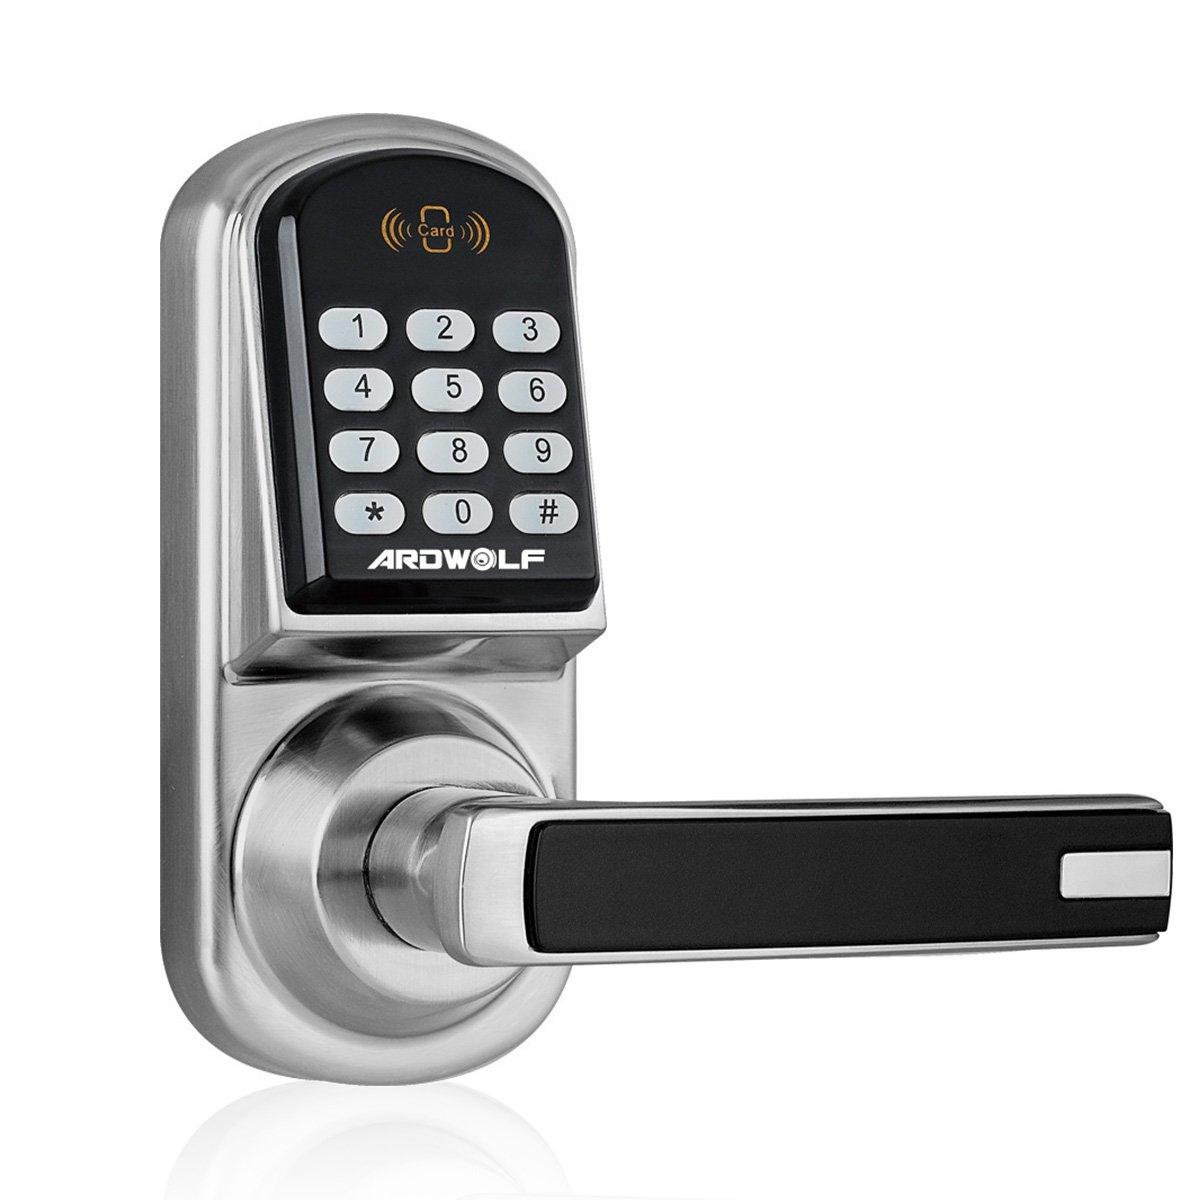 ARDWOLF A30 Smart Keypad Door Lock, Keyless Entry Digital Electronic Door-Locks with Reversible Lever and Automatic Locking